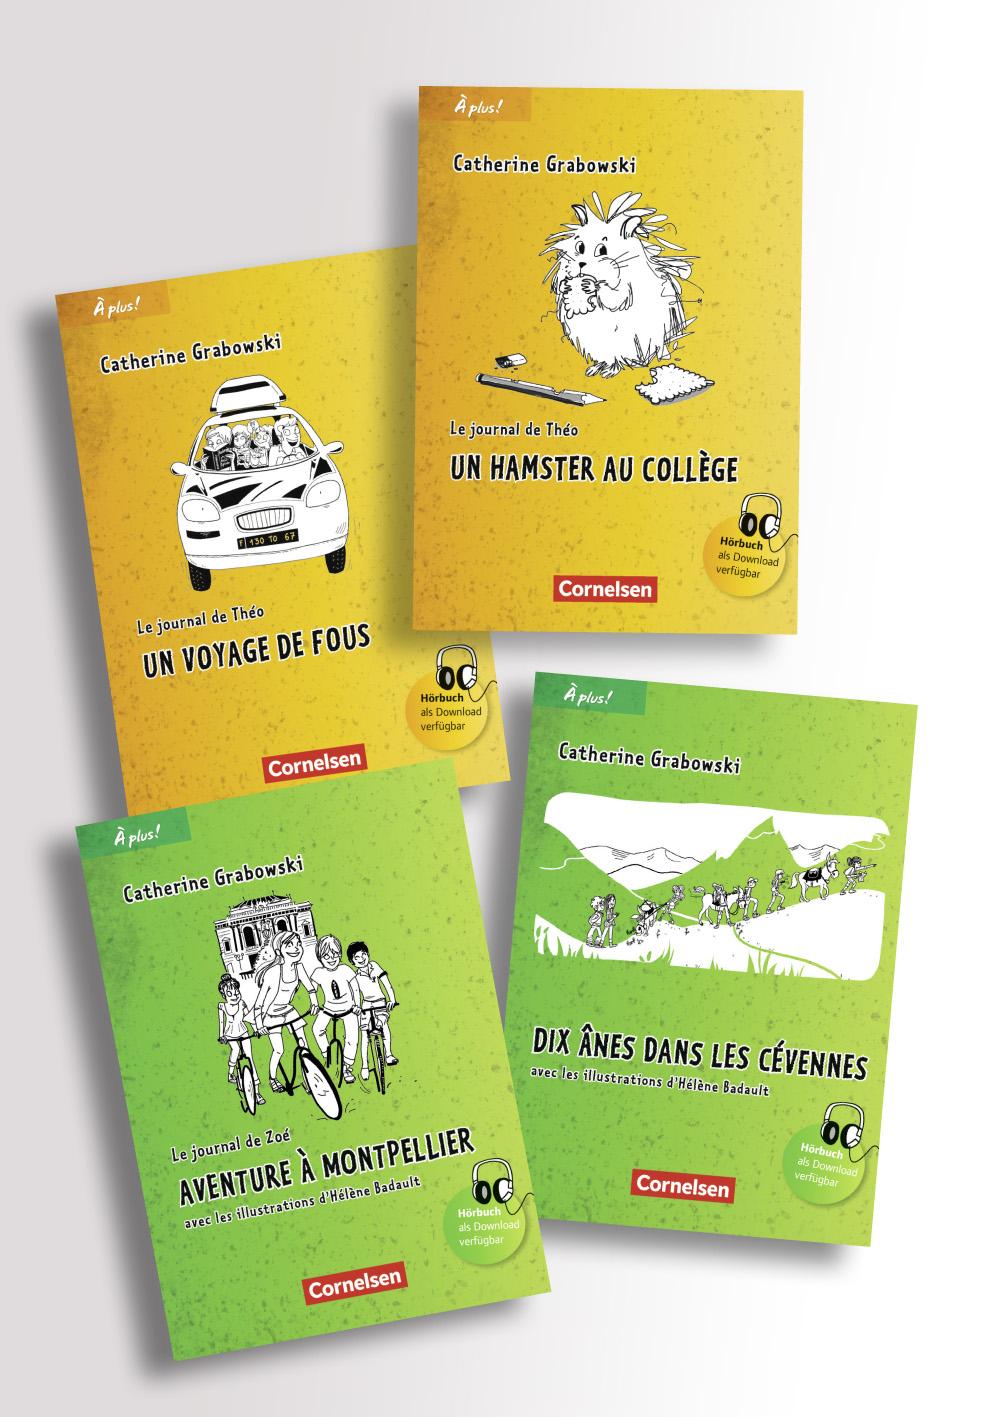 Grafikdesign, Illustration, Buchgestaltung, Covergestaltung, orangerie, grafikdesign